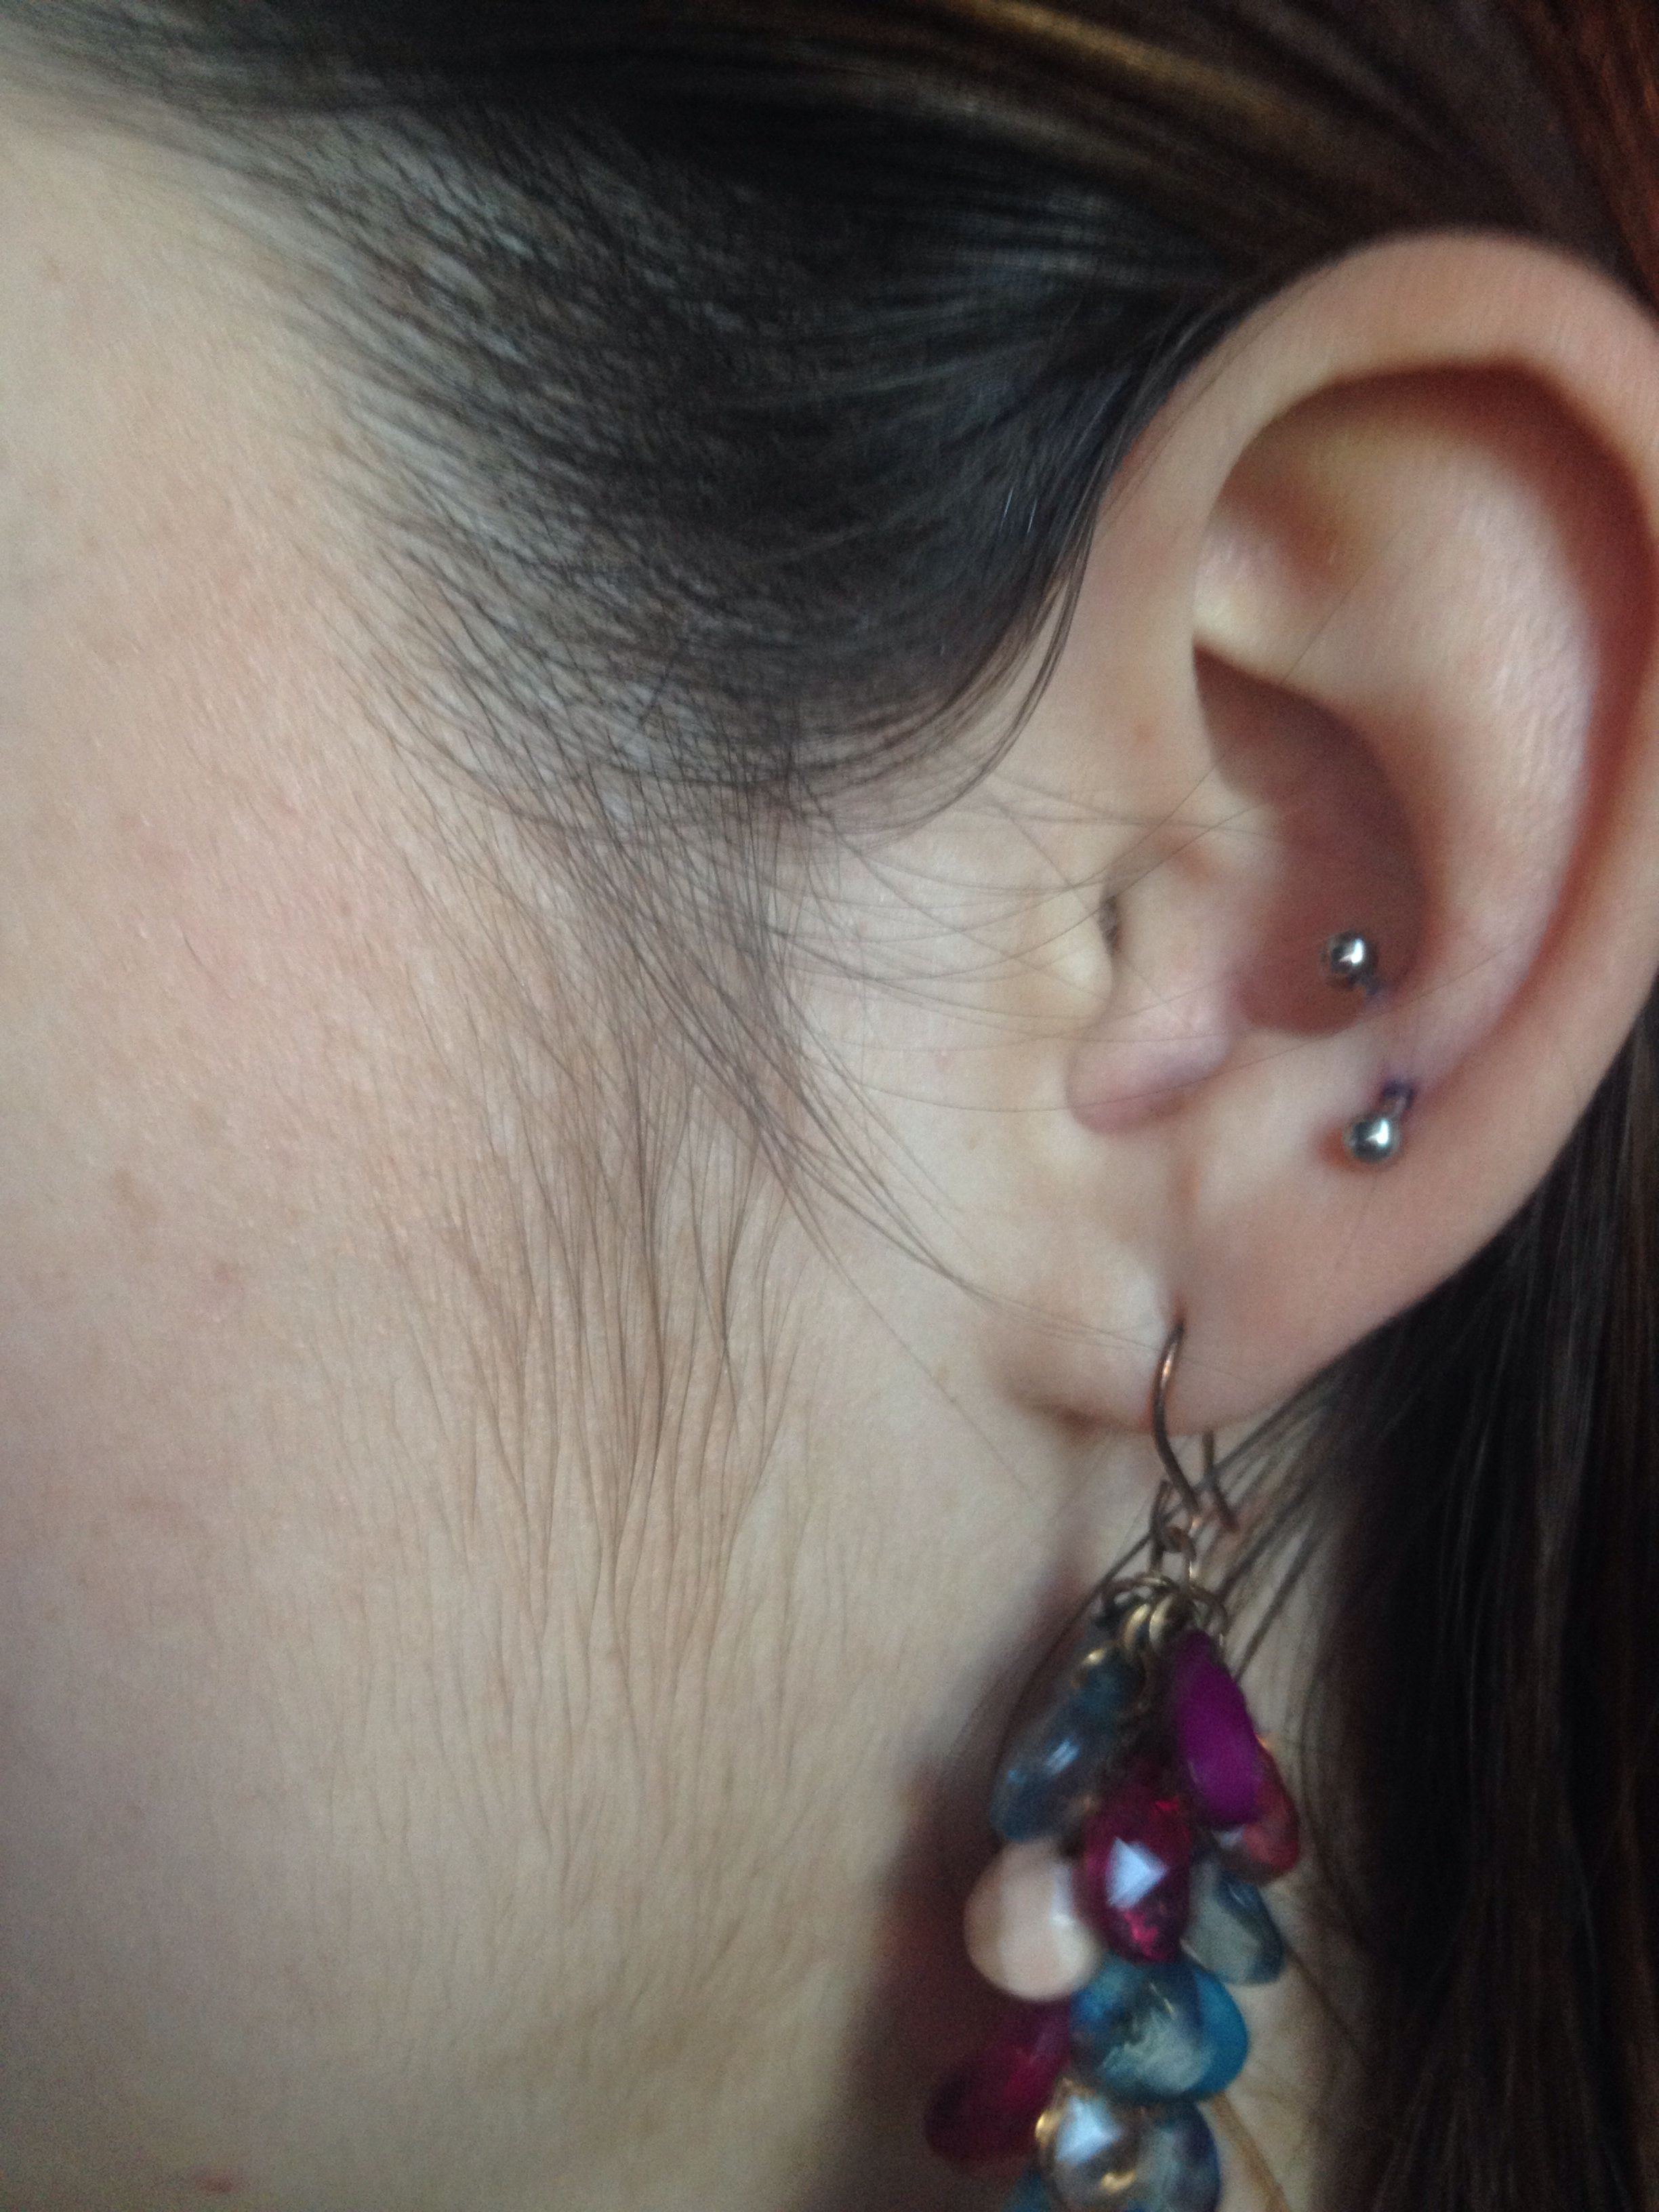 New piercing ideas  My new antitragus piercing I got yesterday   Stylinu  Pinterest